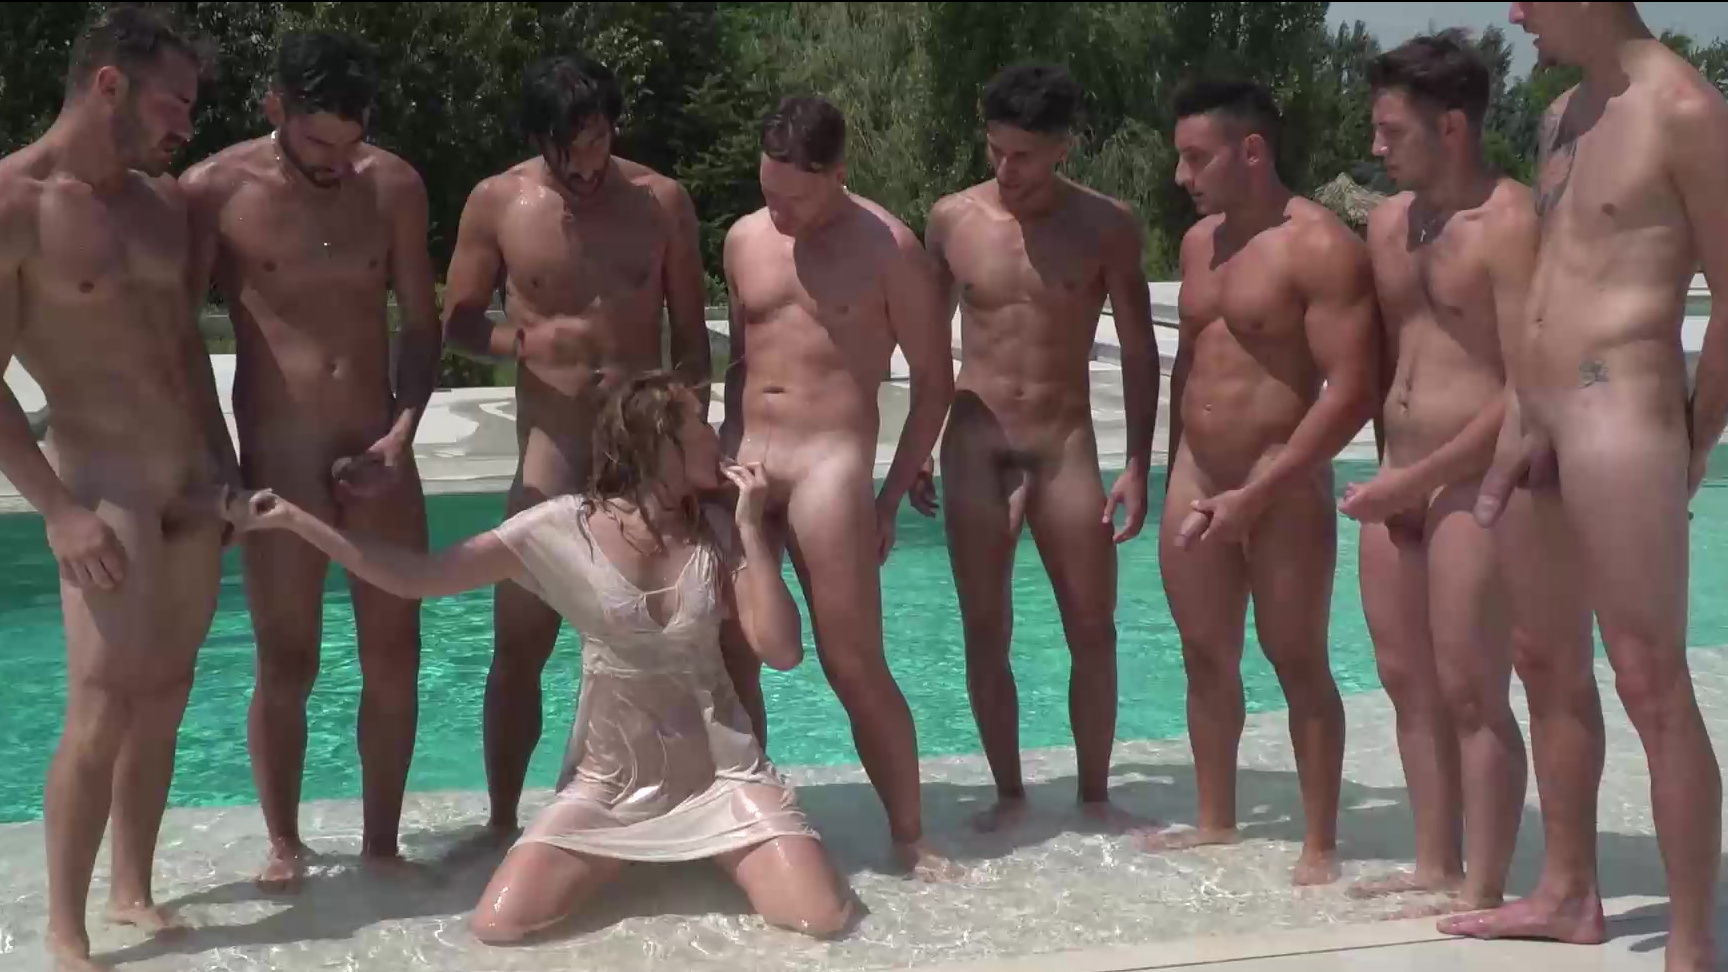 Strip search female guards